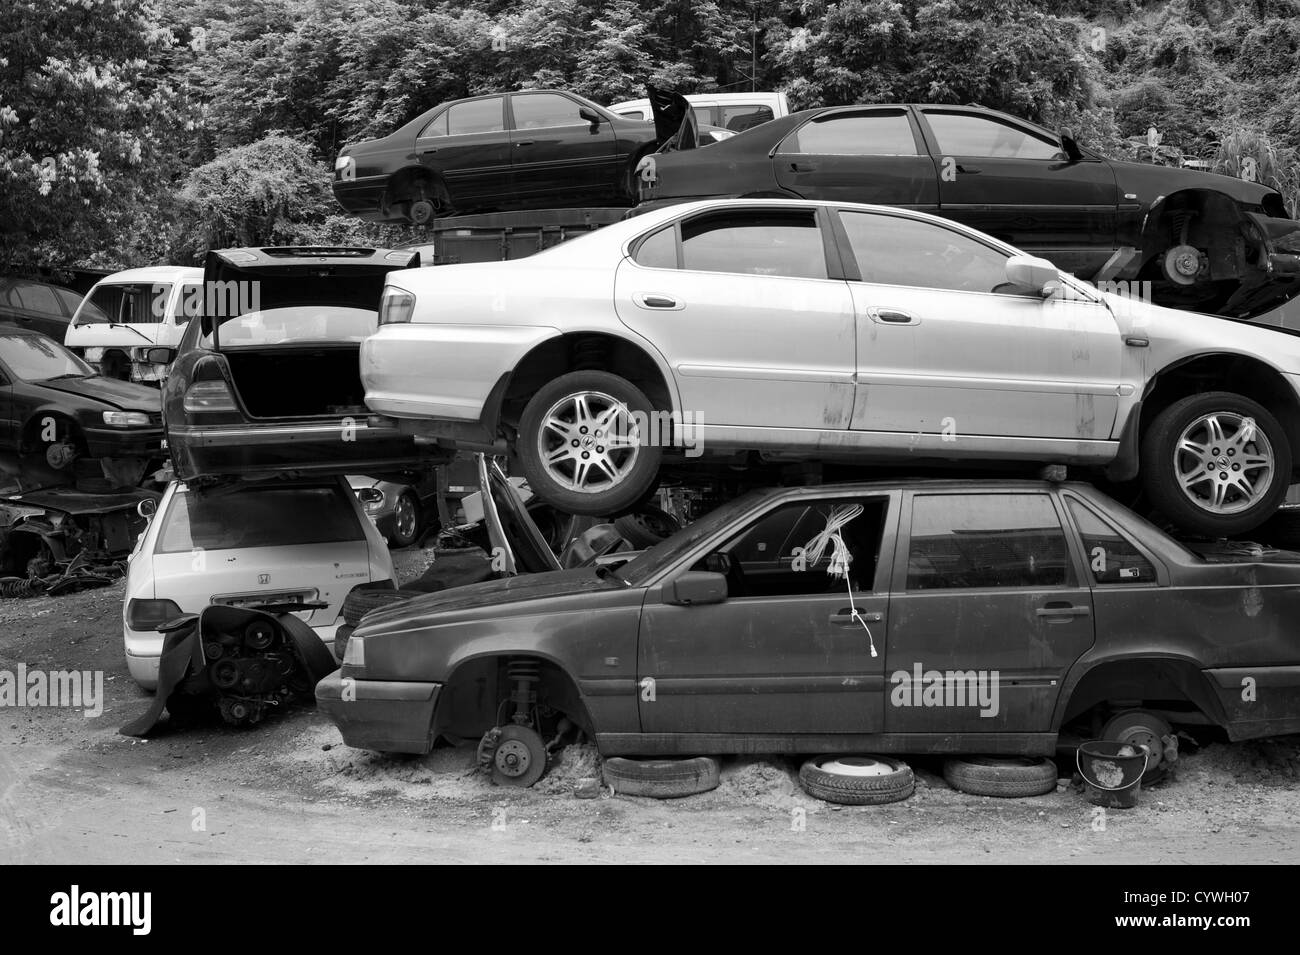 Cars piled up in a wreckers yard,macau Stock Photo: 51578583 - Alamy